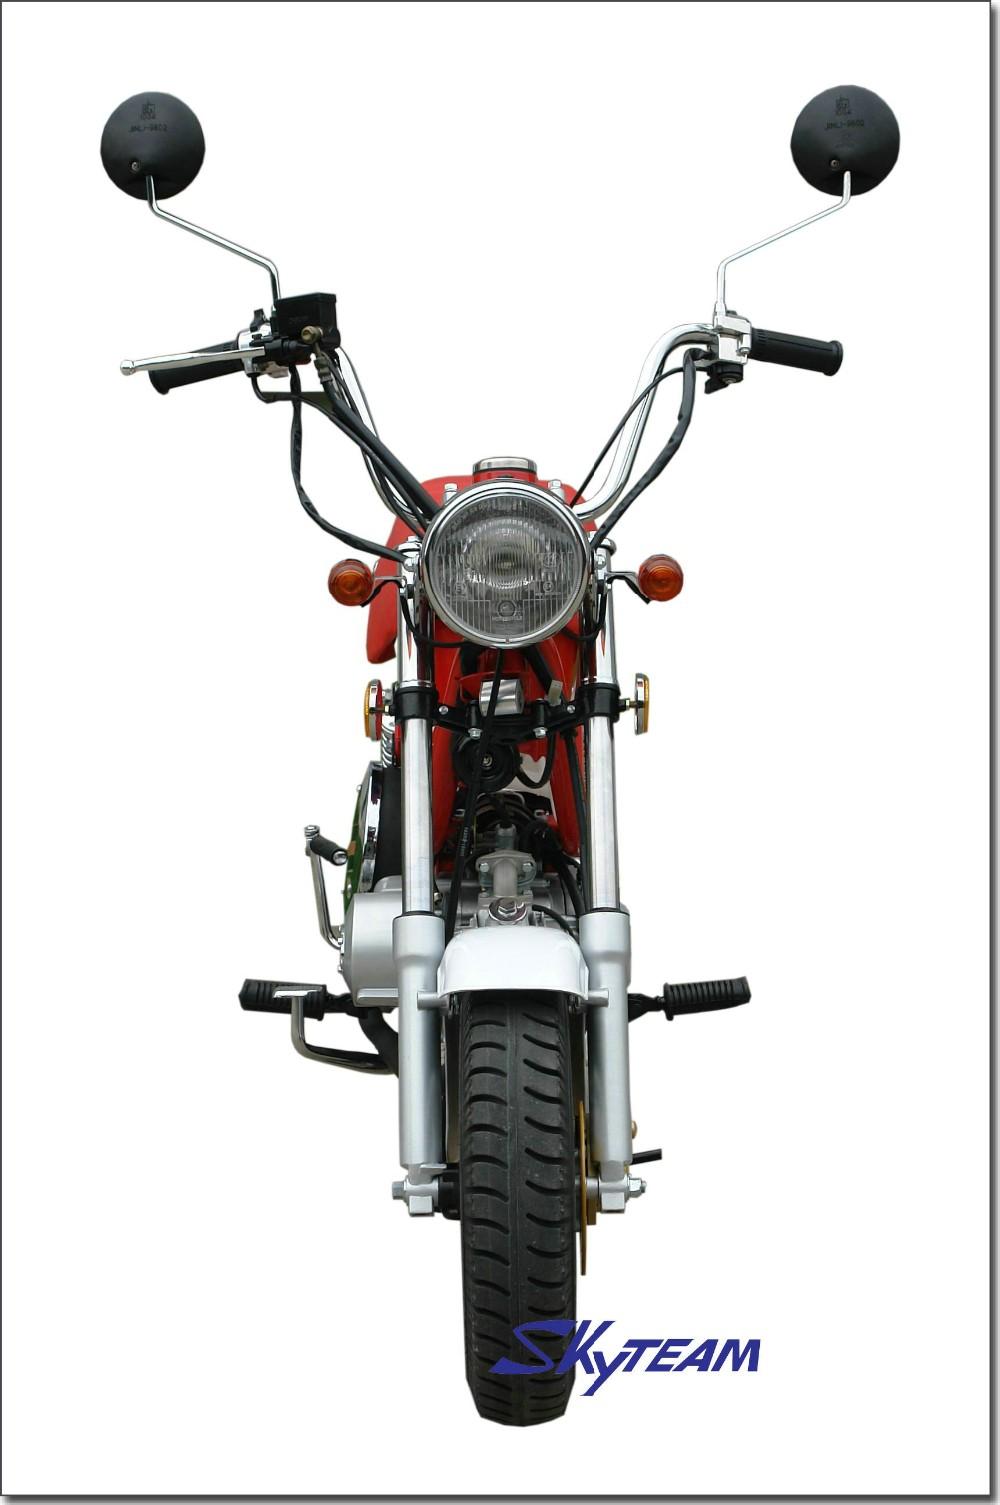 skyteam 4 temps bubbly 50cc et 125cc moto chappy   cee